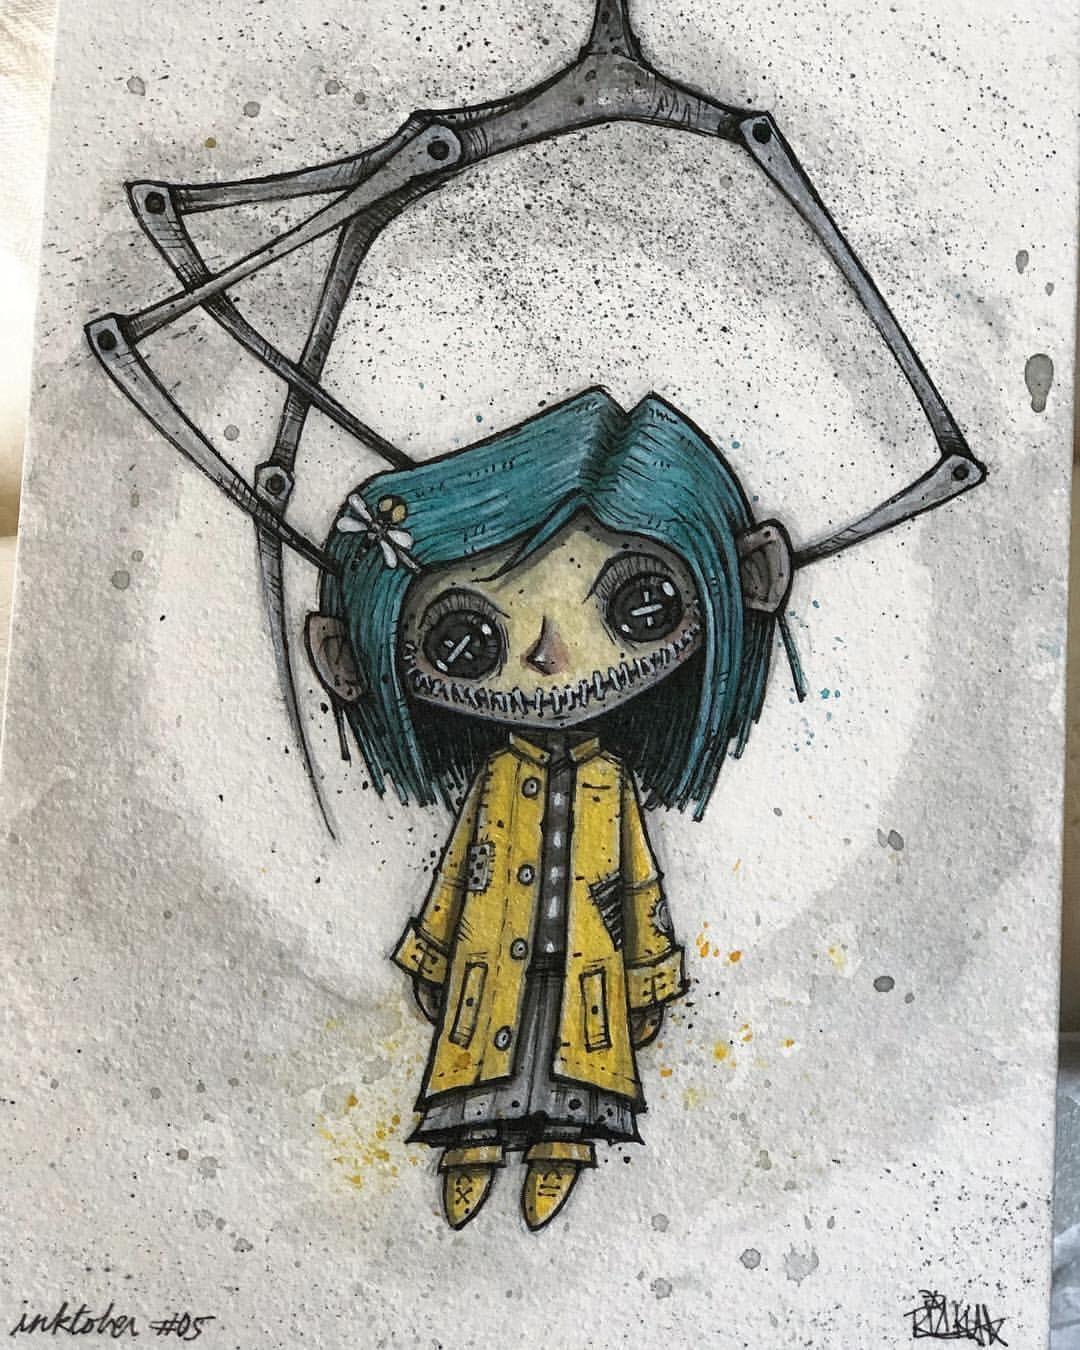 Pin By Zane N On Tim Burton Creepy Drawings Coraline Art Tim